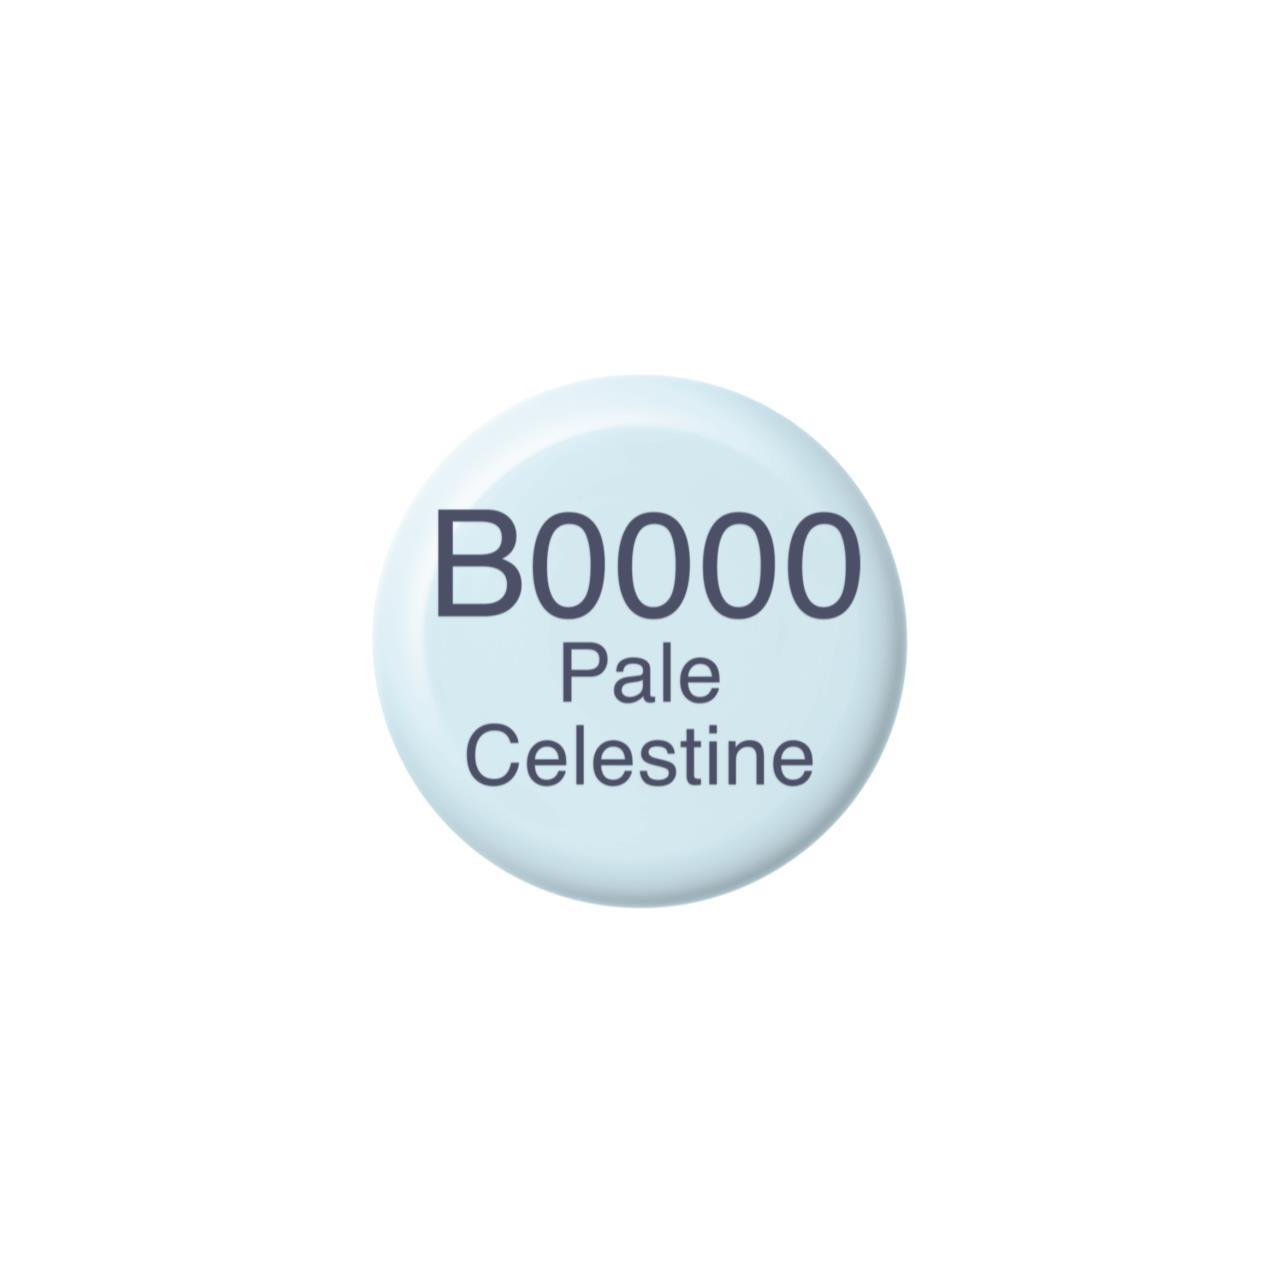 B0000 Pale Celestine, Copic Ink - 4511338055809